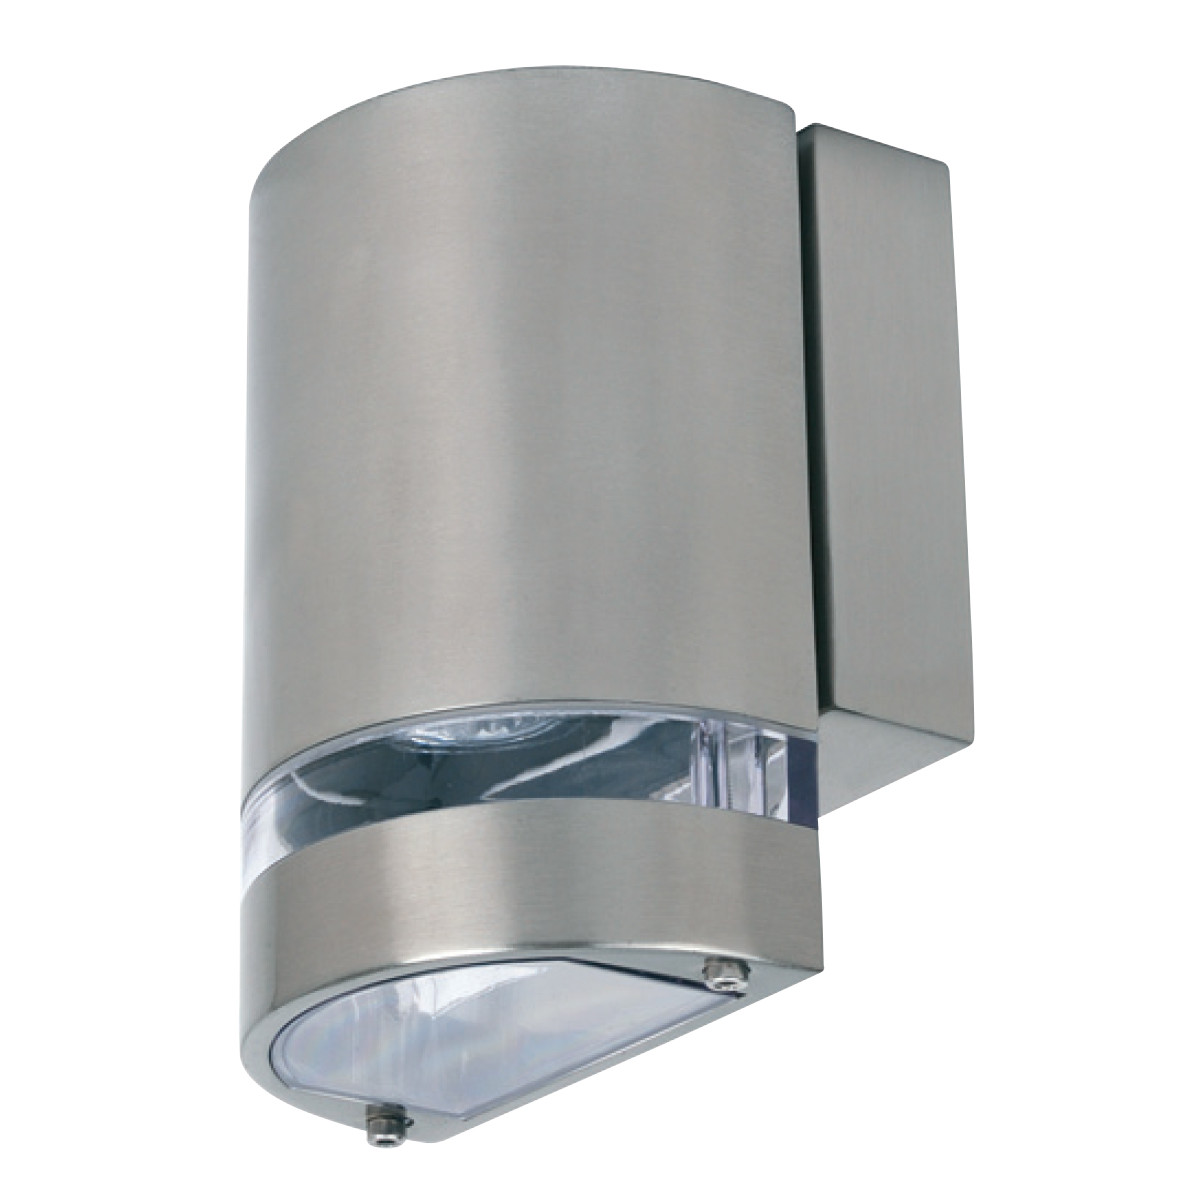 LED Tuinverlichting - Buitenlamp - Gardy 3 - Wand - RVS Mat Chroom - GU10 - Ovaal